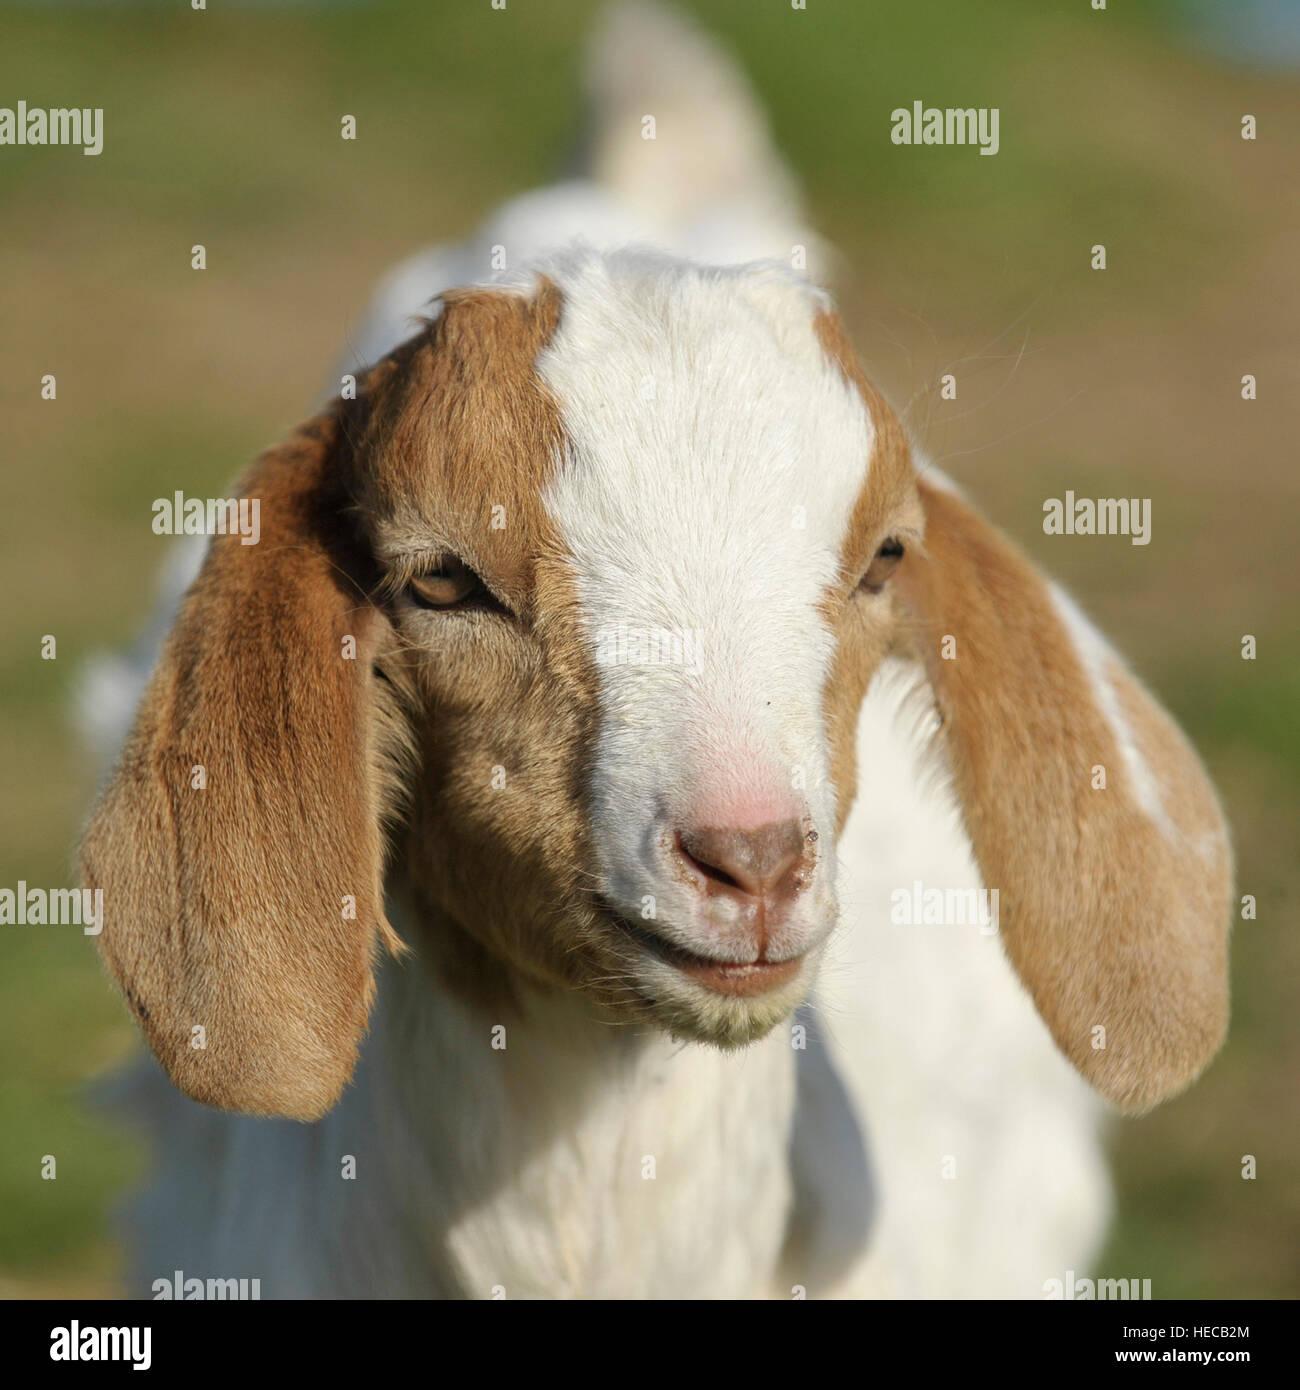 boer goat kid 2 weeks old - Stock Image